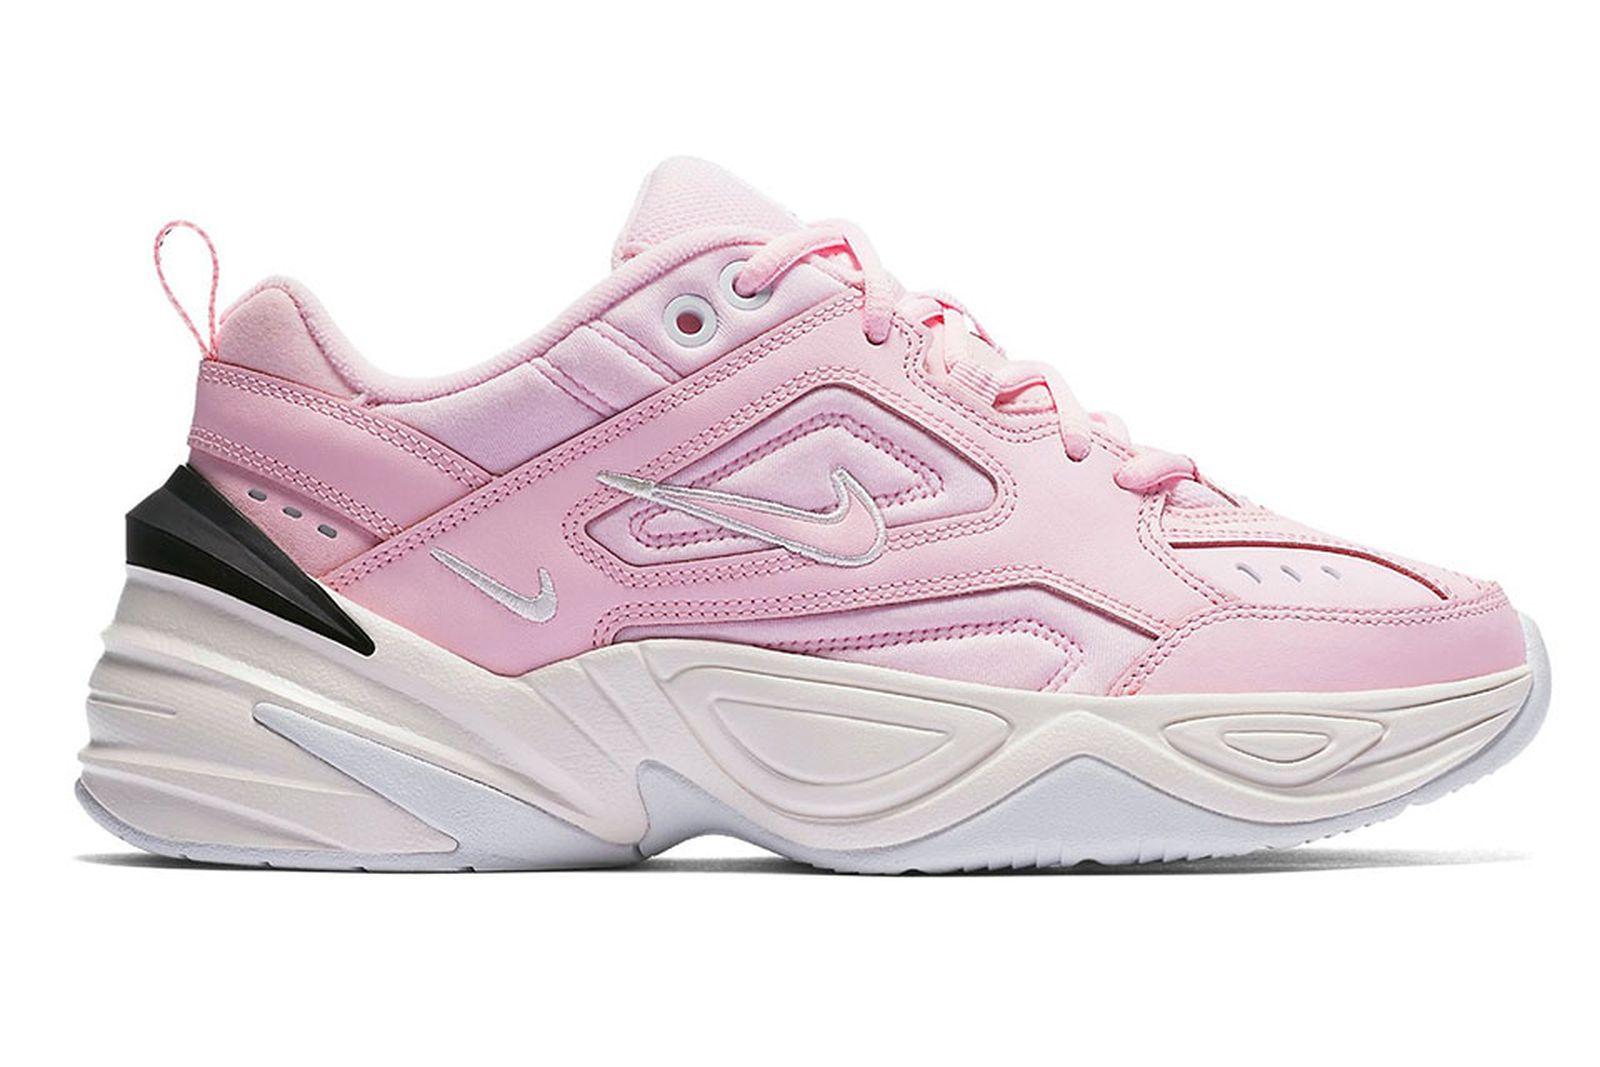 nike-wmns-m2k-tekno-pink-foam-release-date-price-01